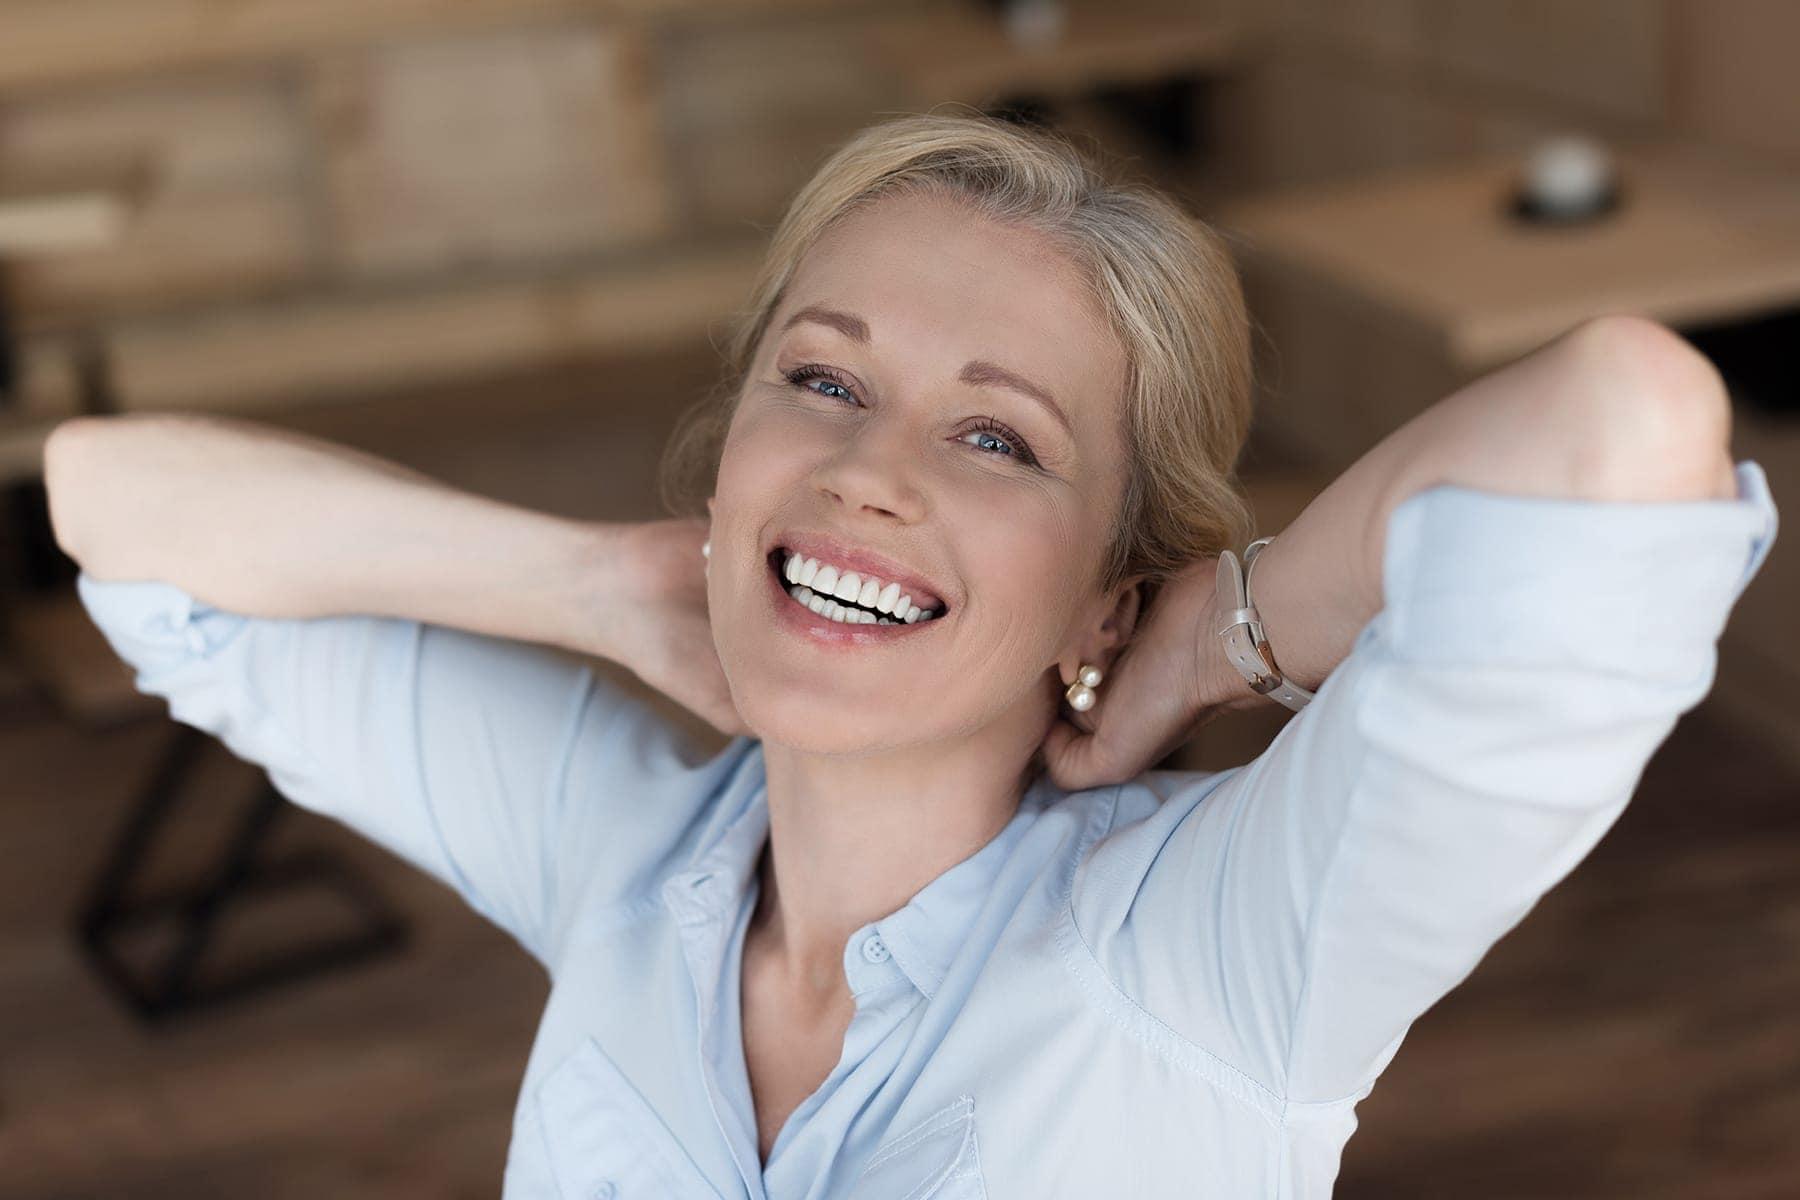 veneer dentures